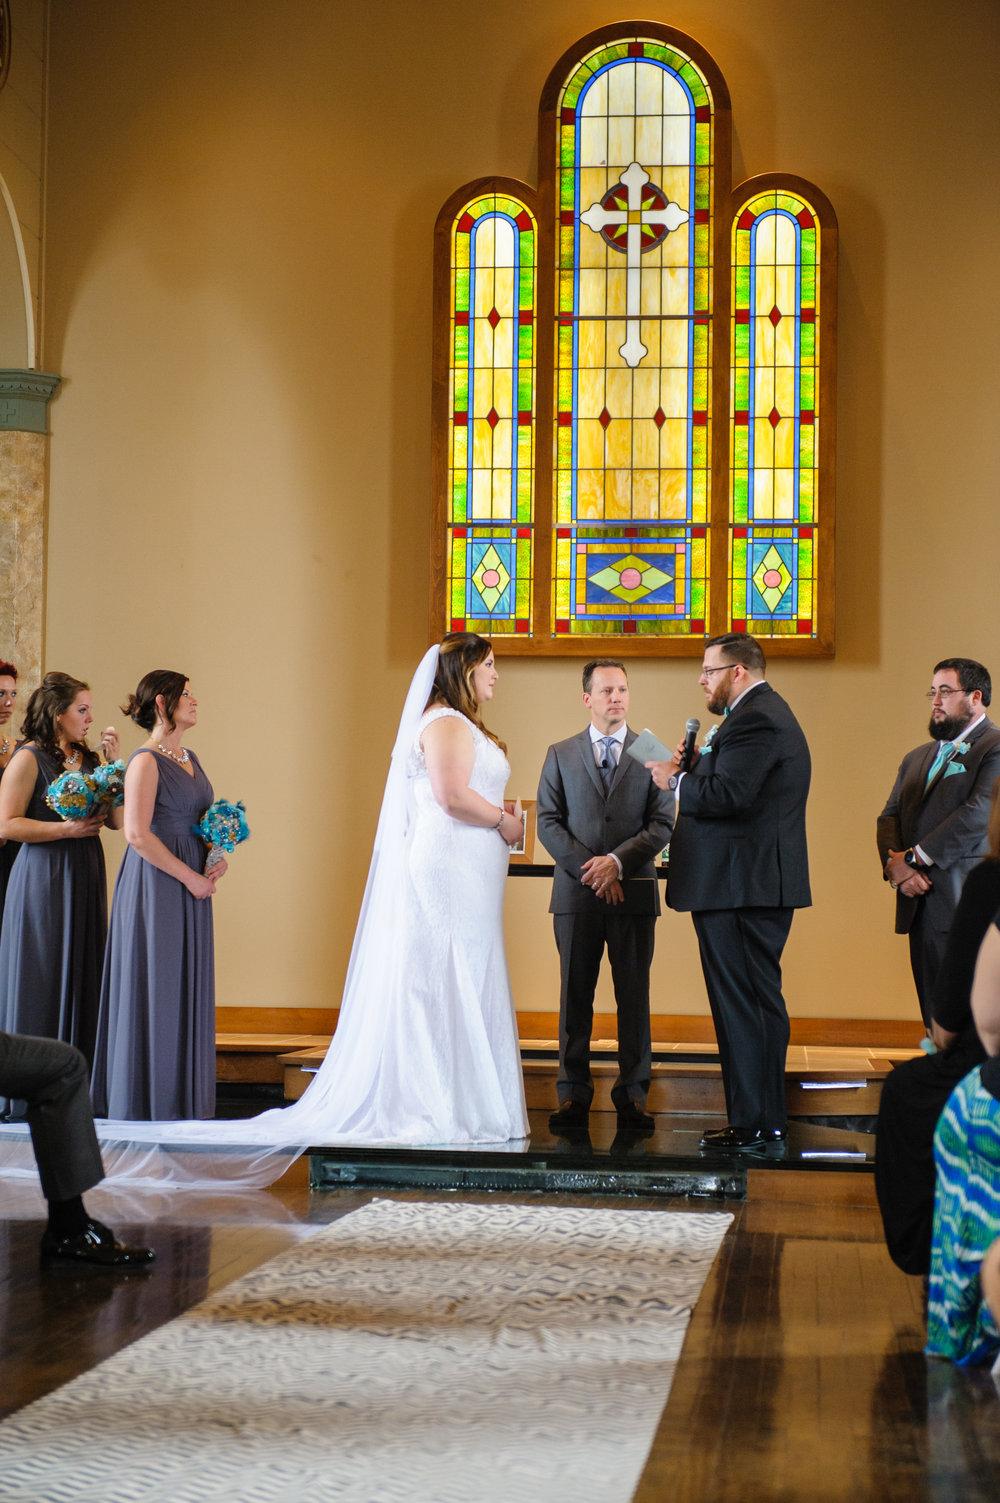 tim-sorbo-wisconsin-wedding-officiant-3.jpg